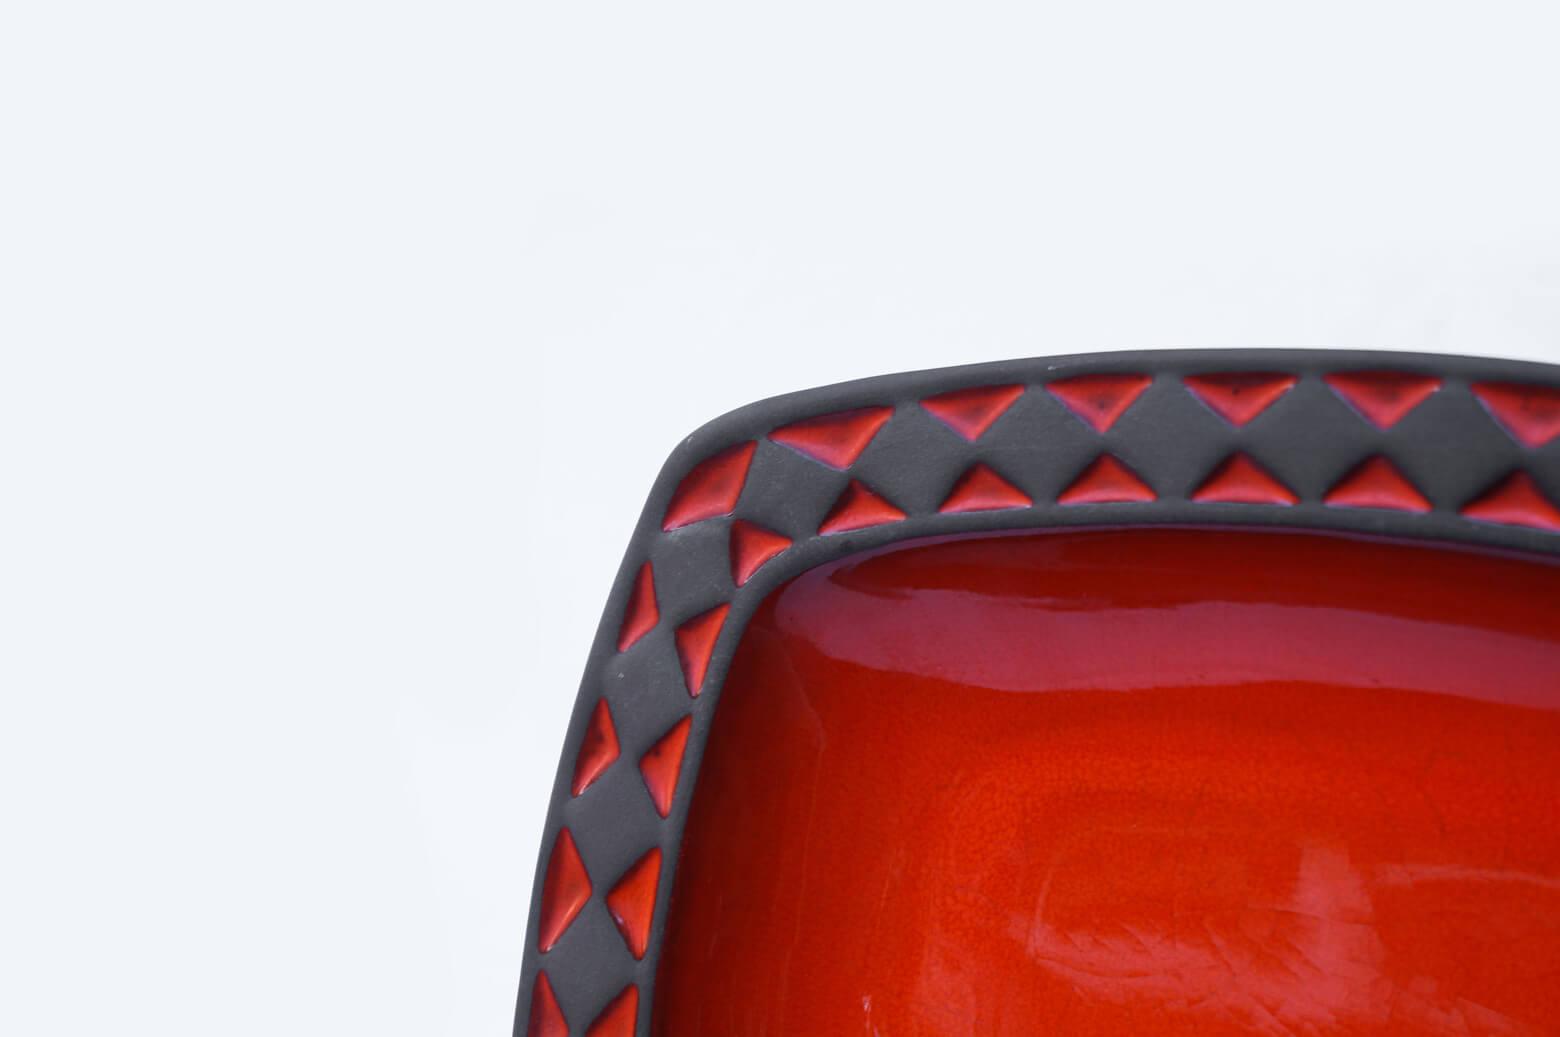 Frank Keramik Denmark Square Tray / フランク ケラミック スクエア トレイ プレート デンマークヴィンテージ 北欧食器